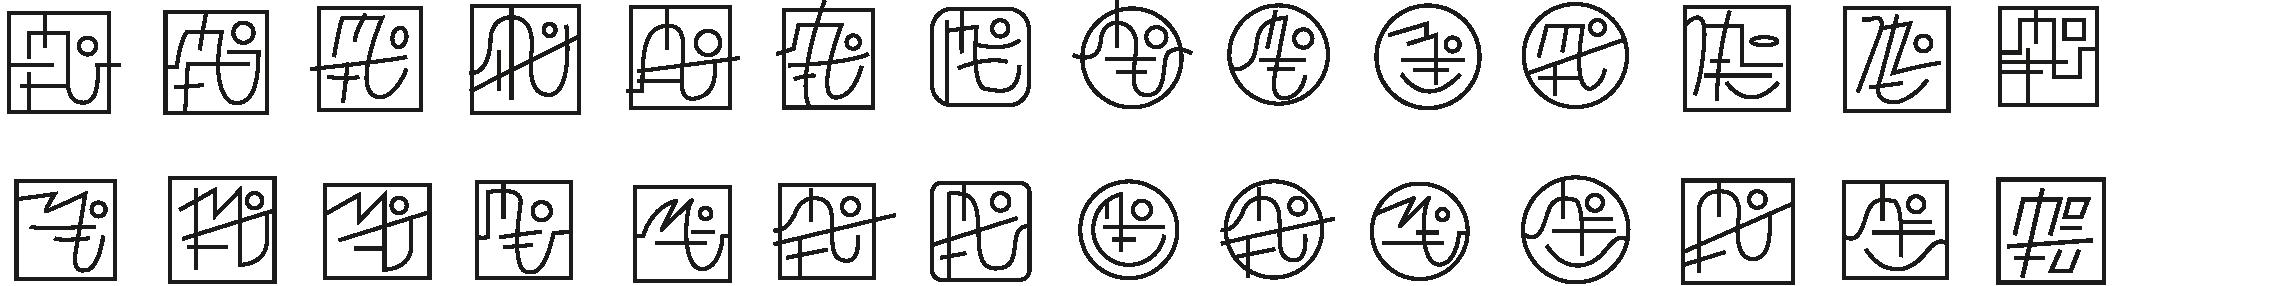 chosen concept's icon exploration